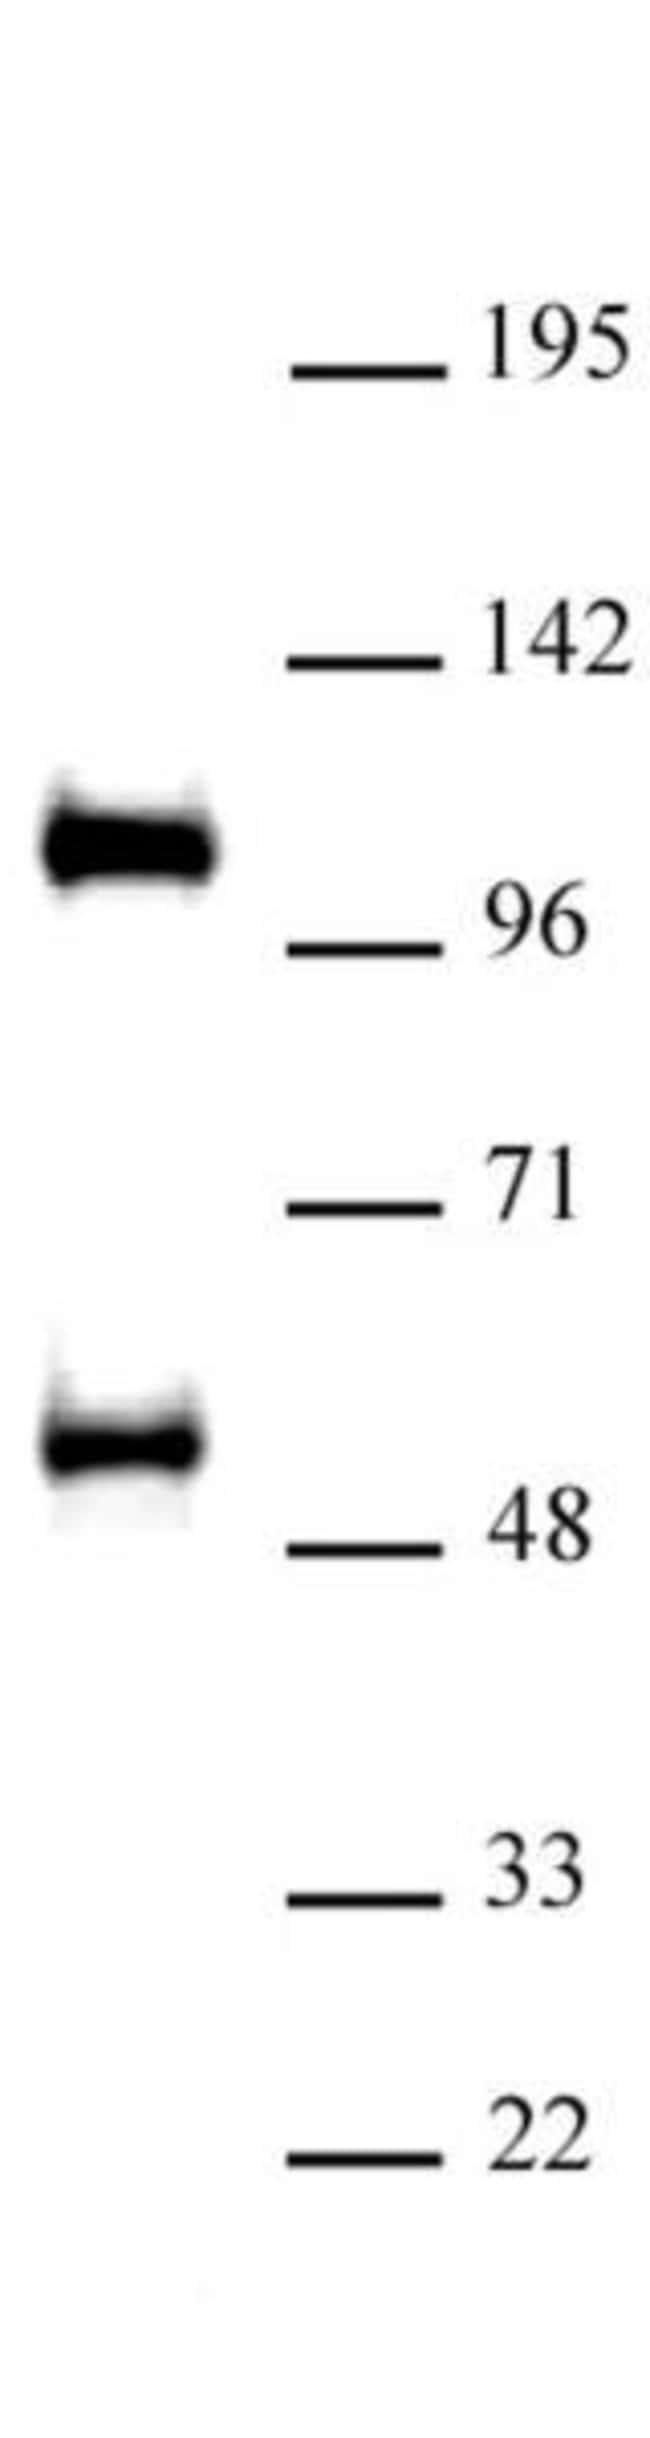 TAZ / WWTR1 Rabbit anti-Human, Unconjugated, Polyclonal, Active Motif:Antibodies:Primary